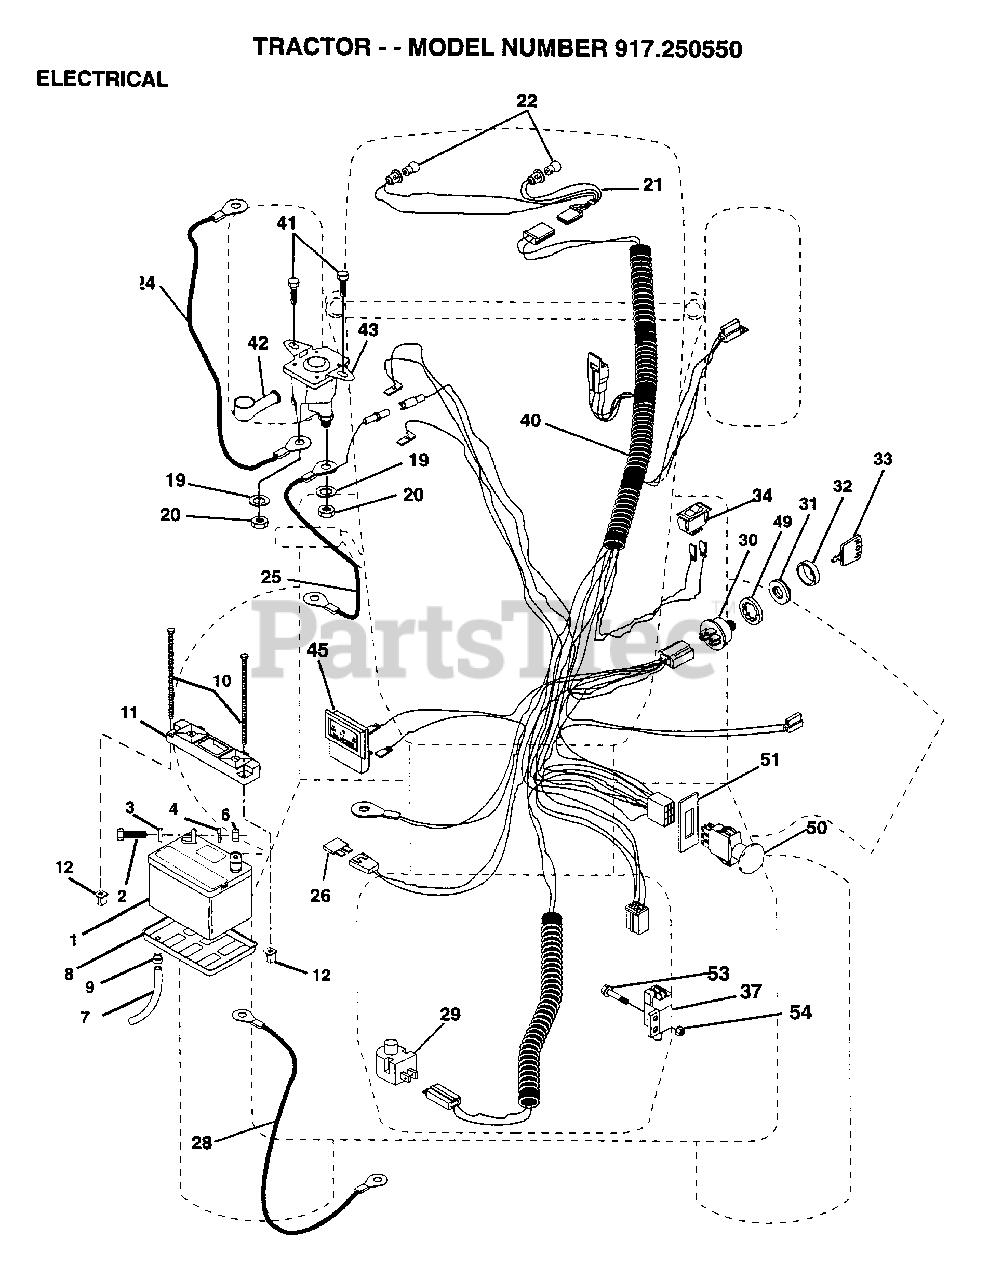 [DIAGRAM] Wiring Diagram Craftsman Garden Tractor 917